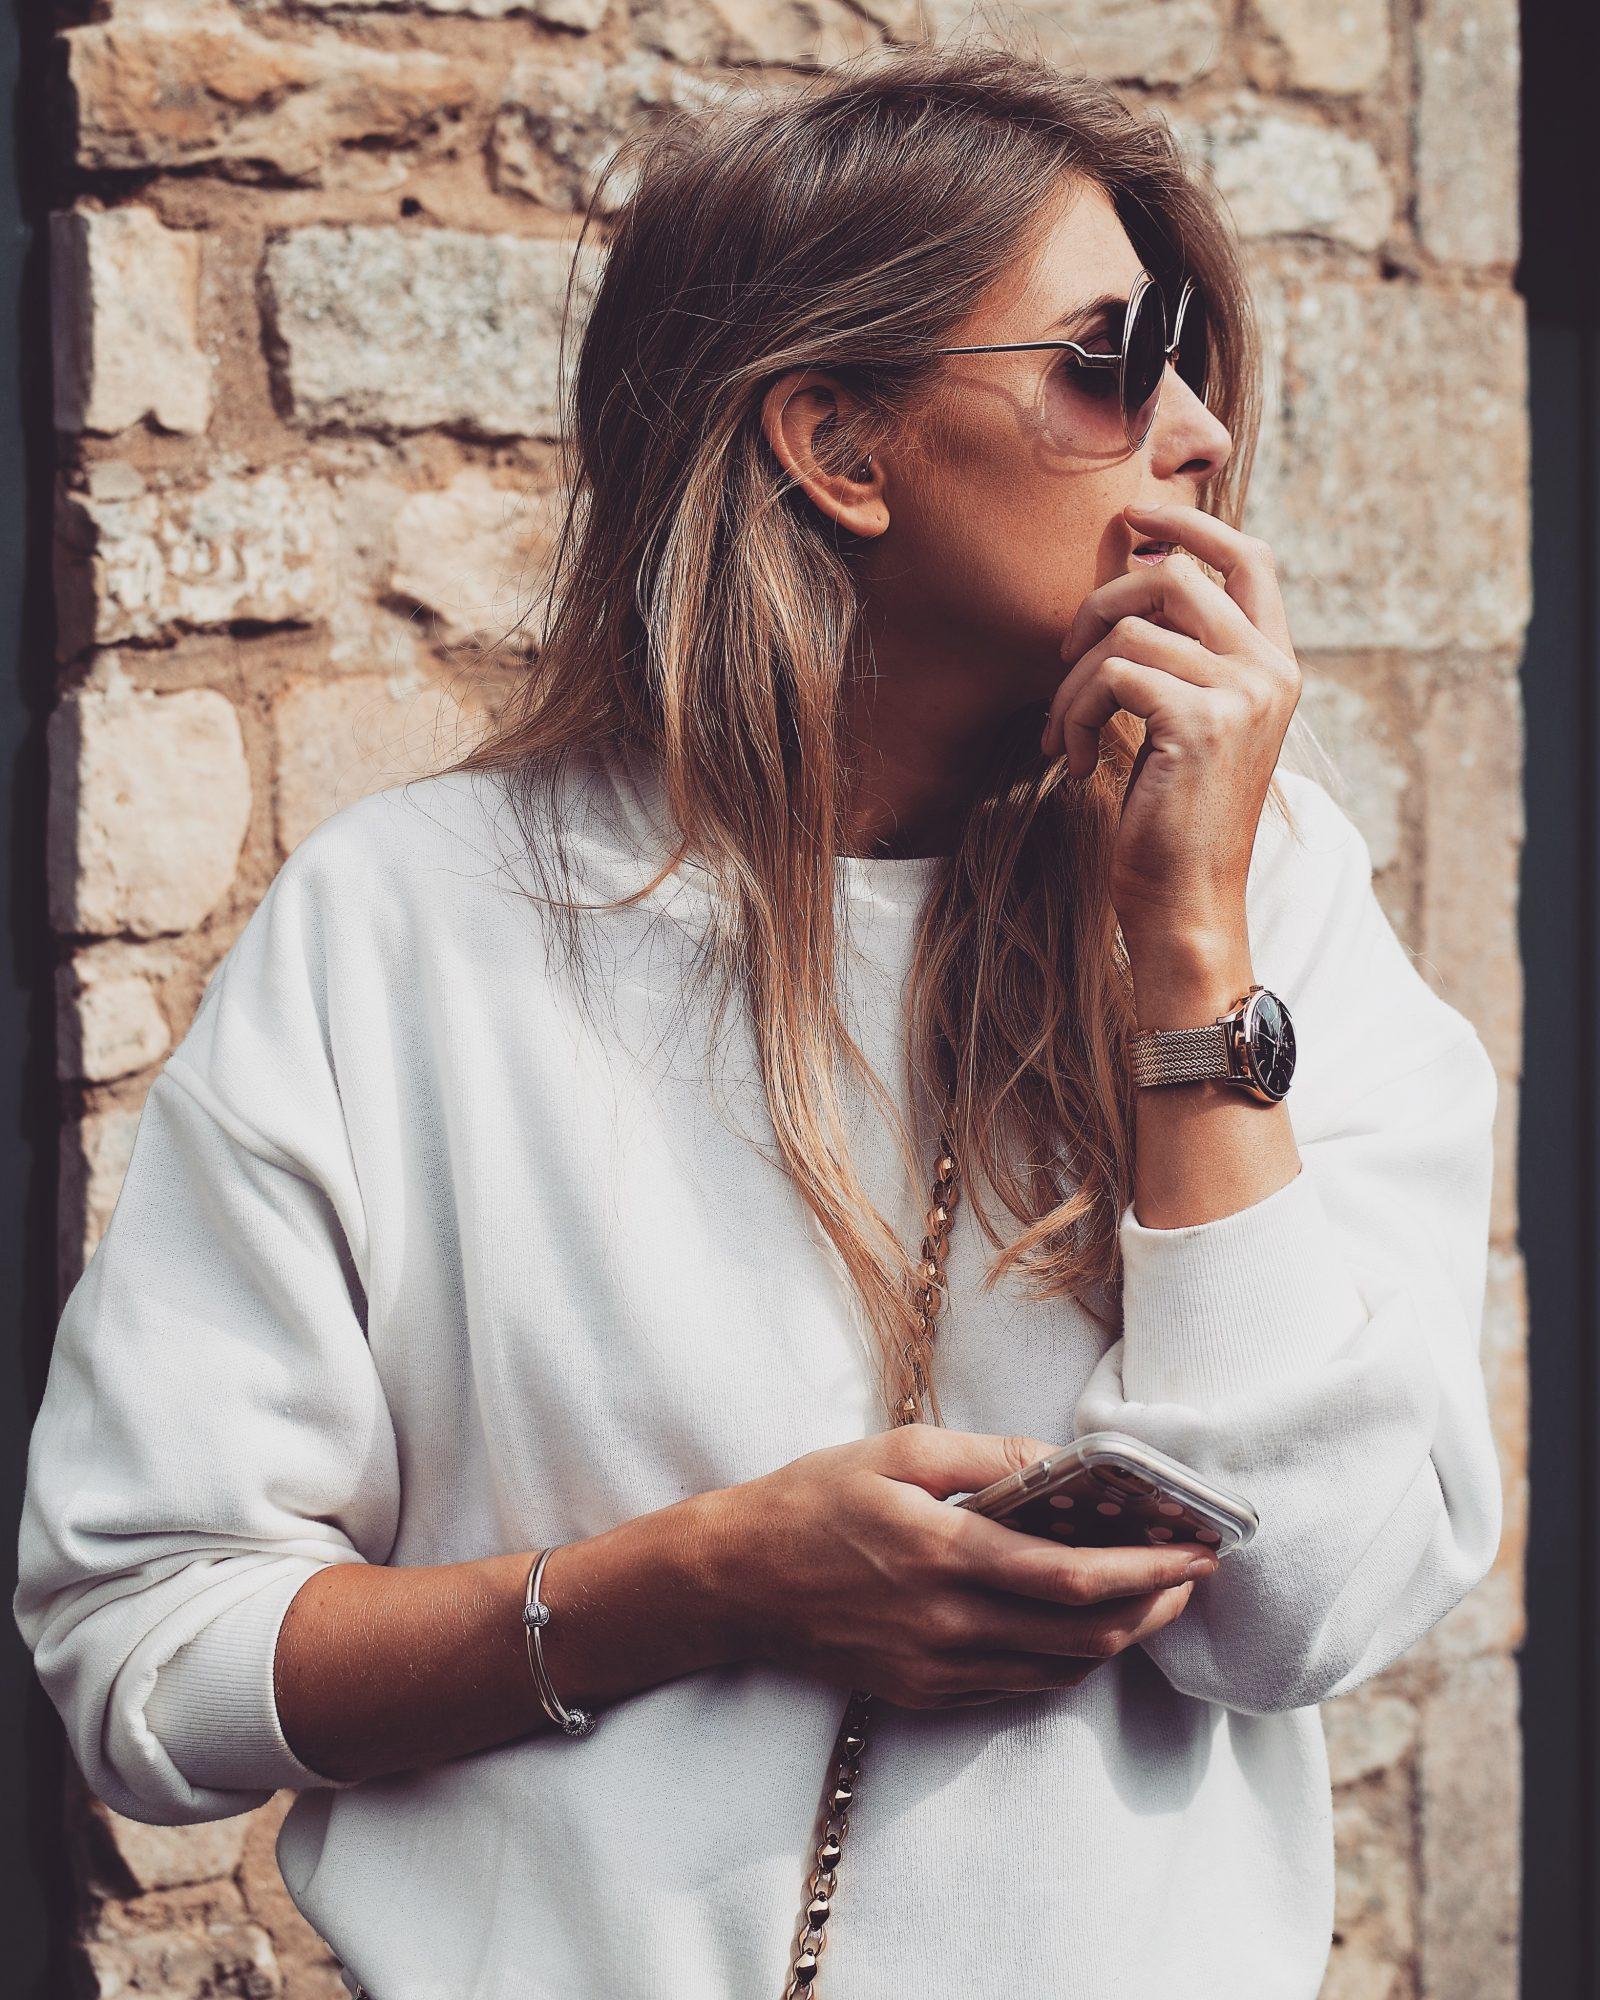 Real Time Haul - White Sweatshirt